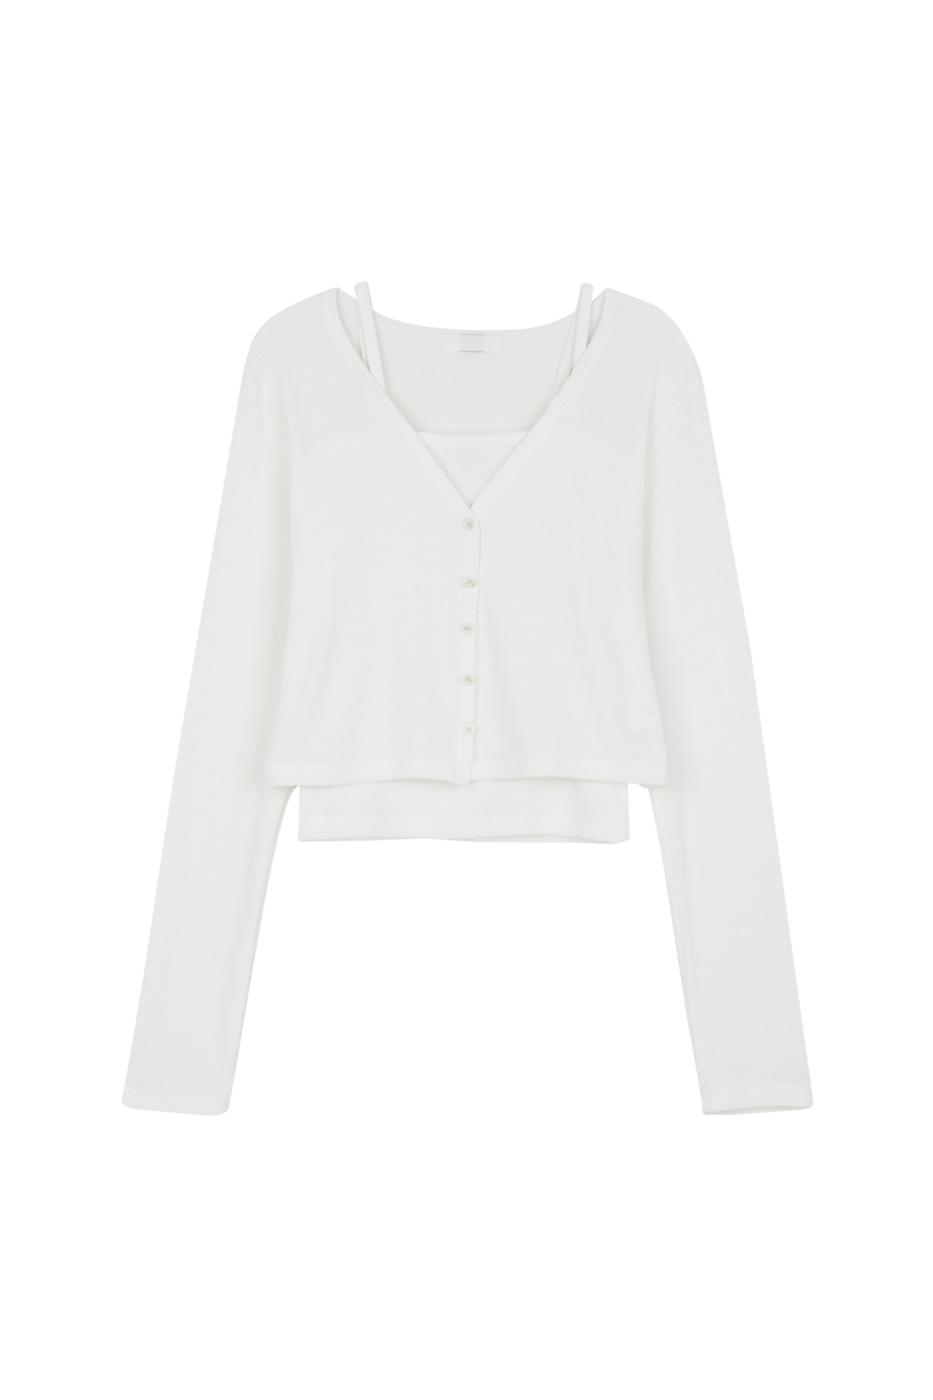 Milk sleeveless set cardigan